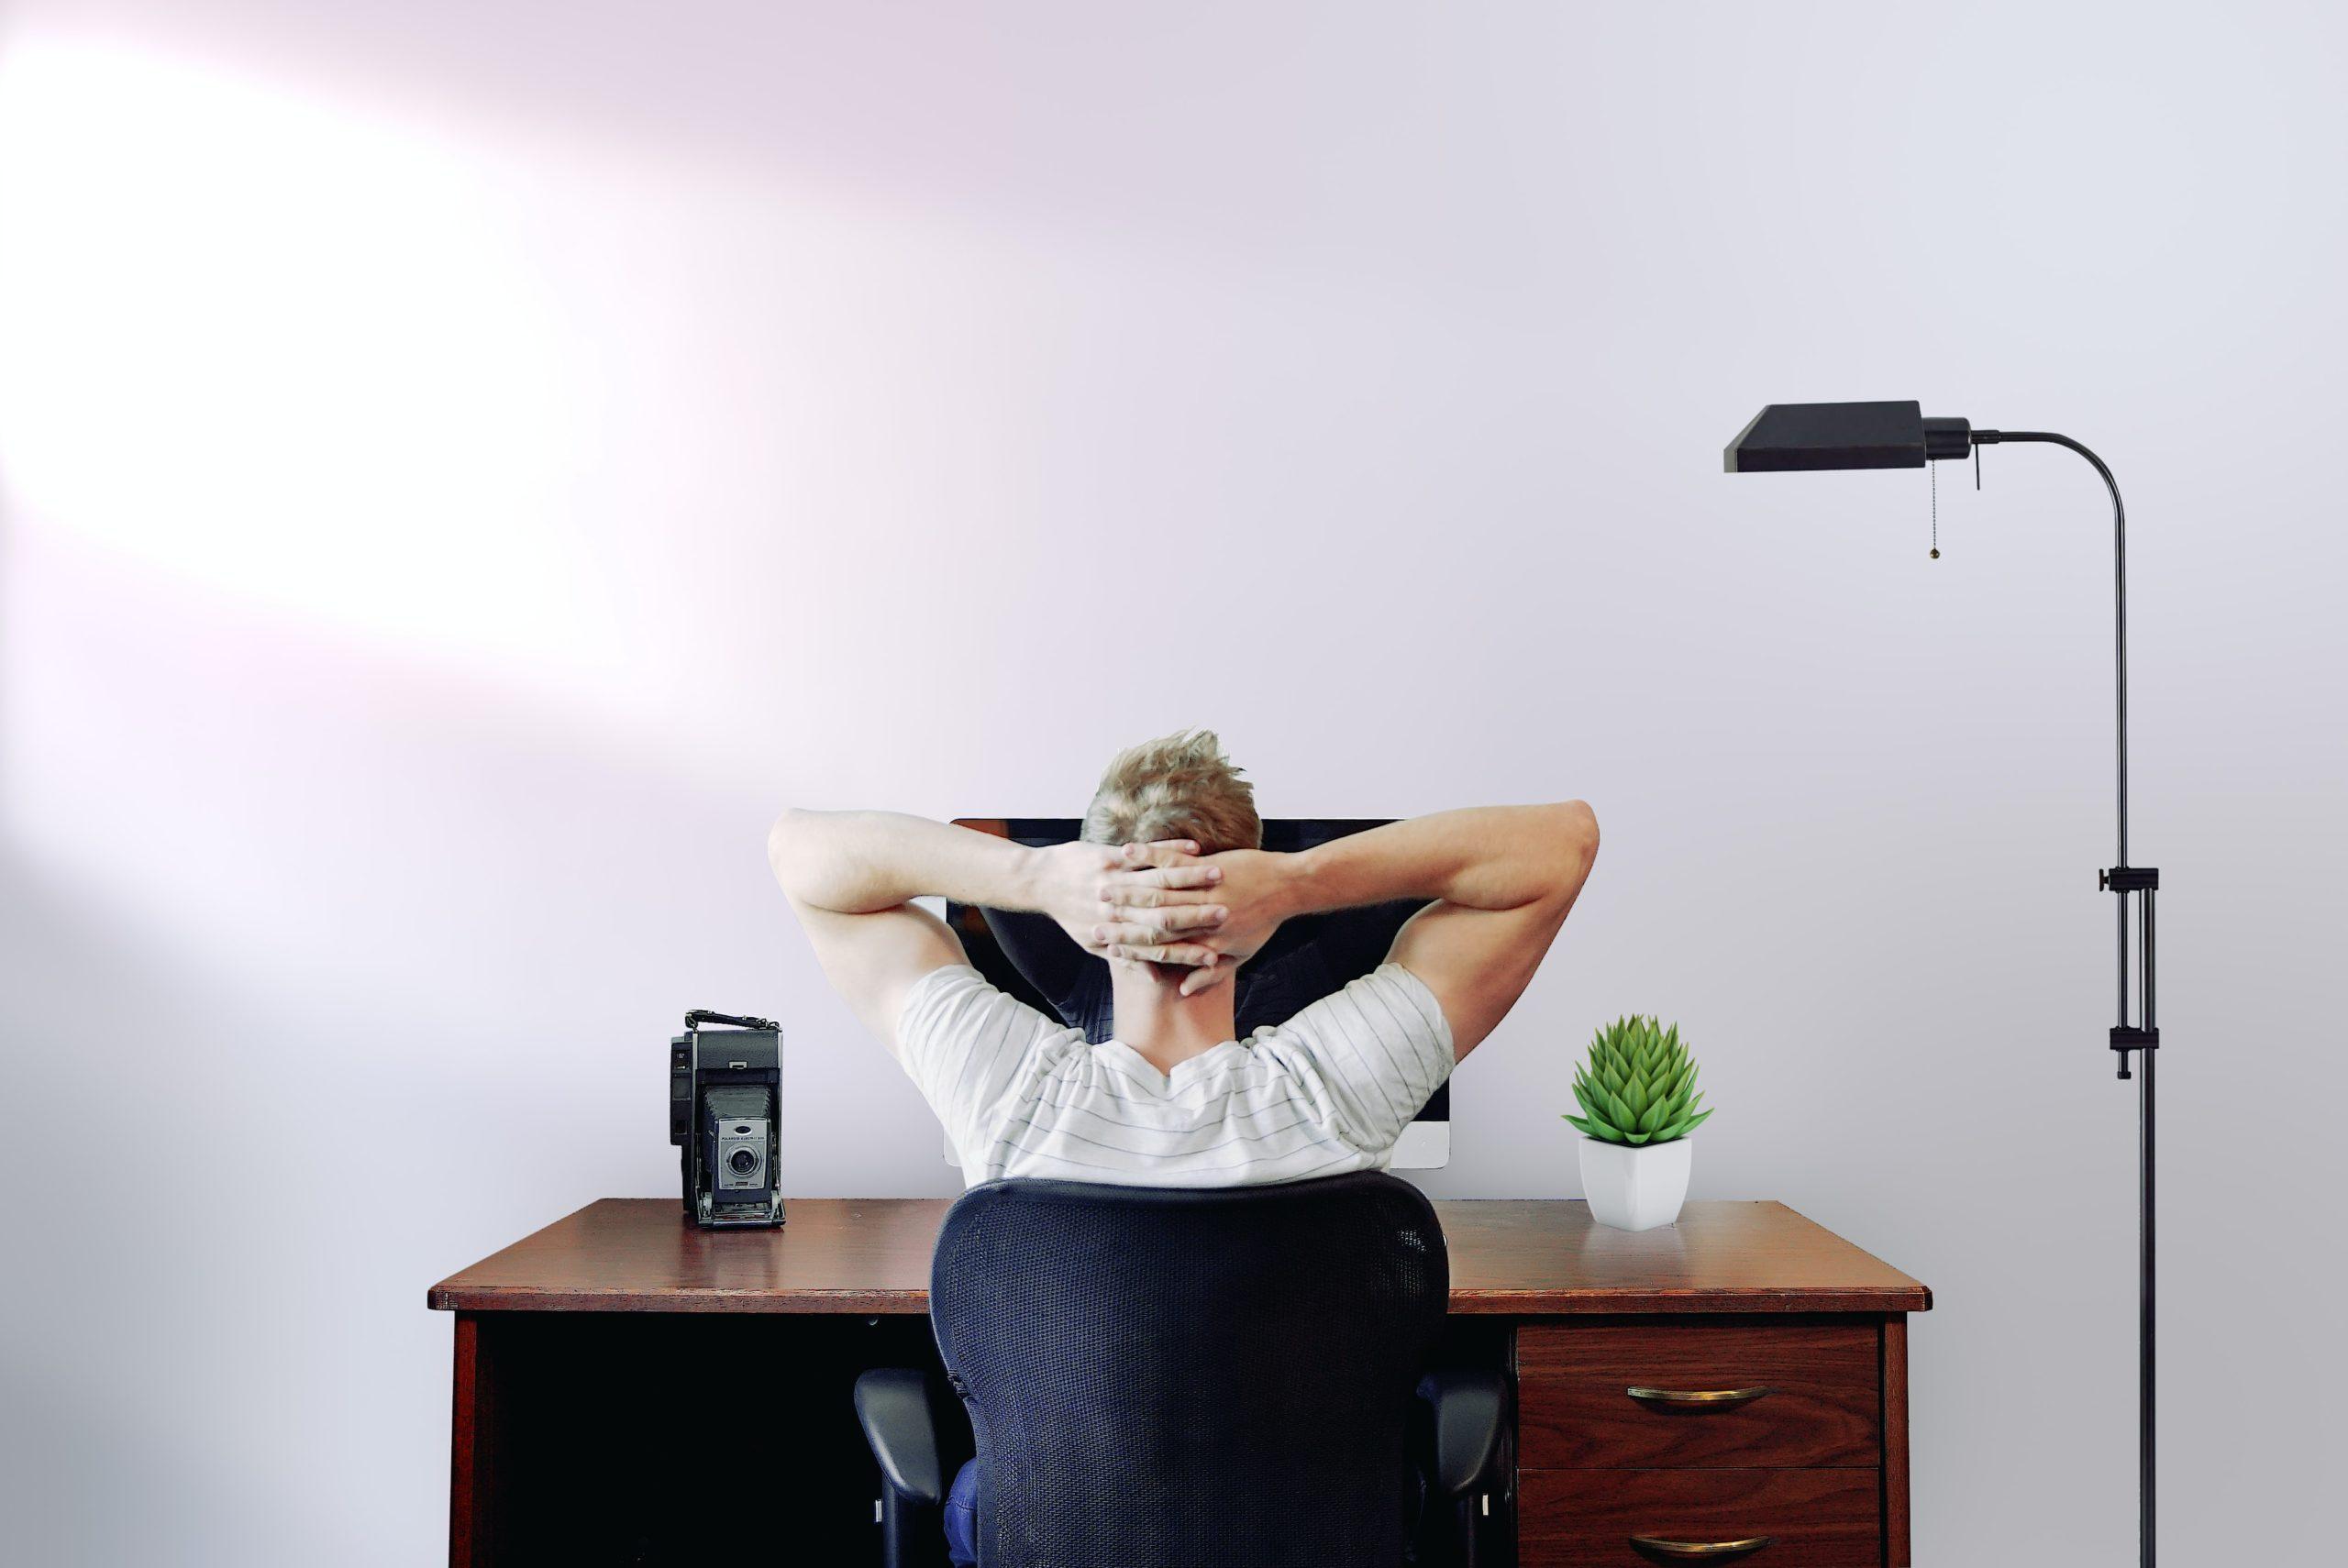 Maximizing Productivity and Managing Paranoia While Working Remotely